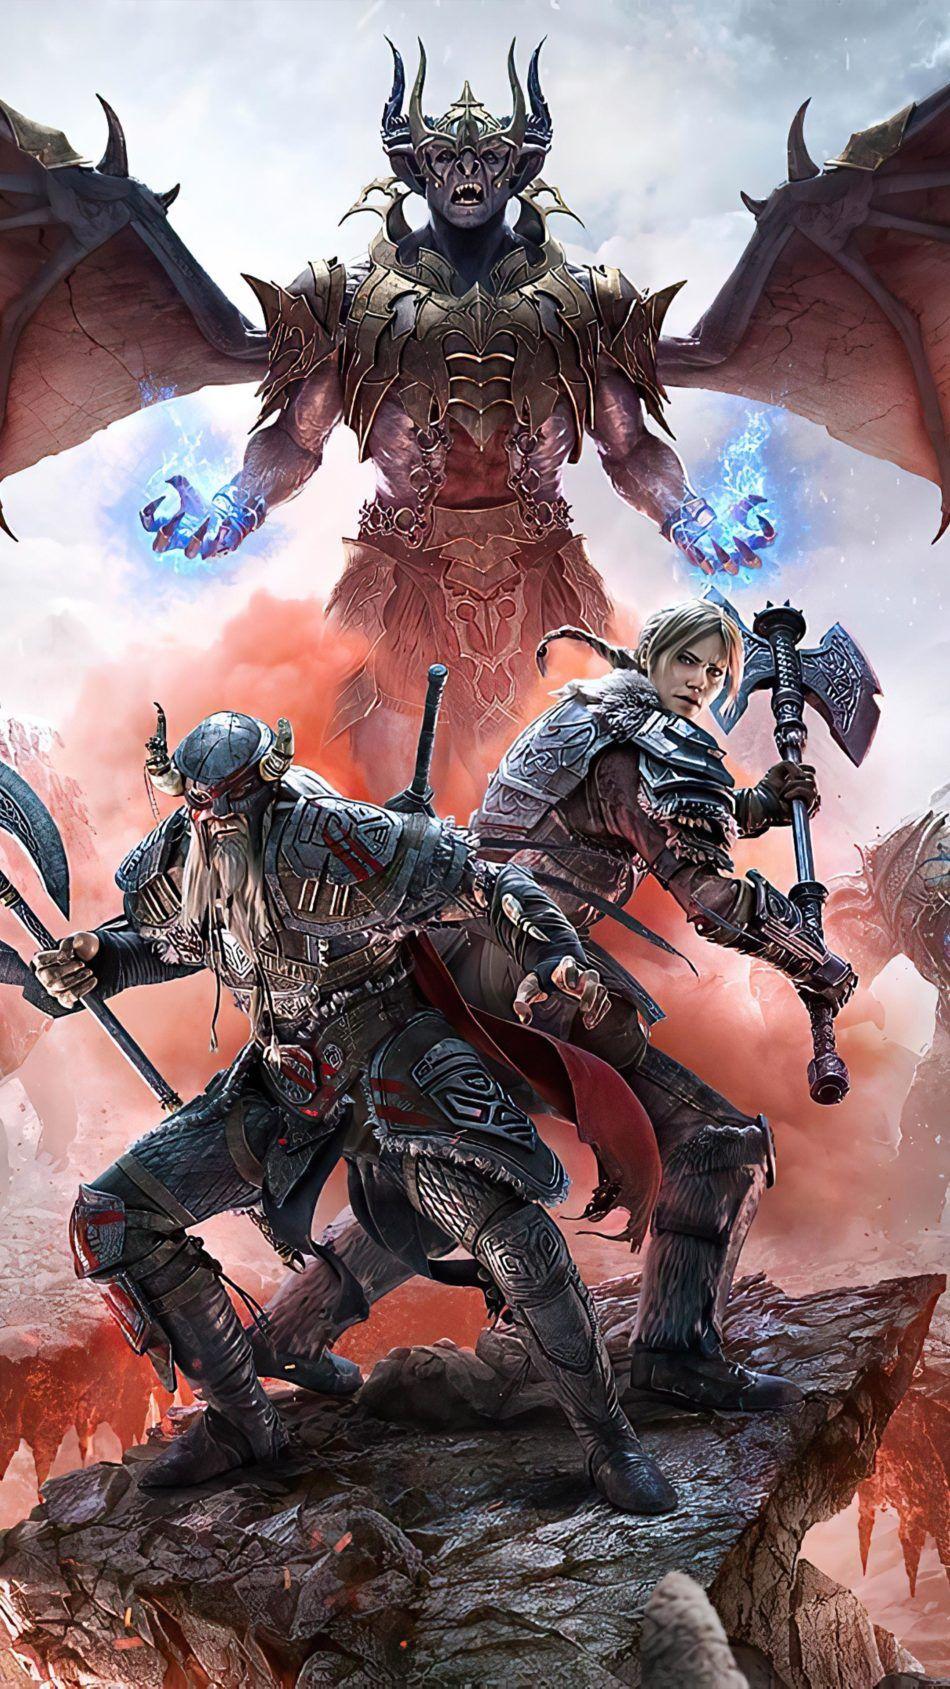 The Elder Scrolls Online Greymoor Poster 4k Ultra Hd Mobile Wallpaper Elder Scrolls Art Elder Scrolls Skyrim Elder Scrolls Online Best of ultra hd skyrim wallpaper 4k